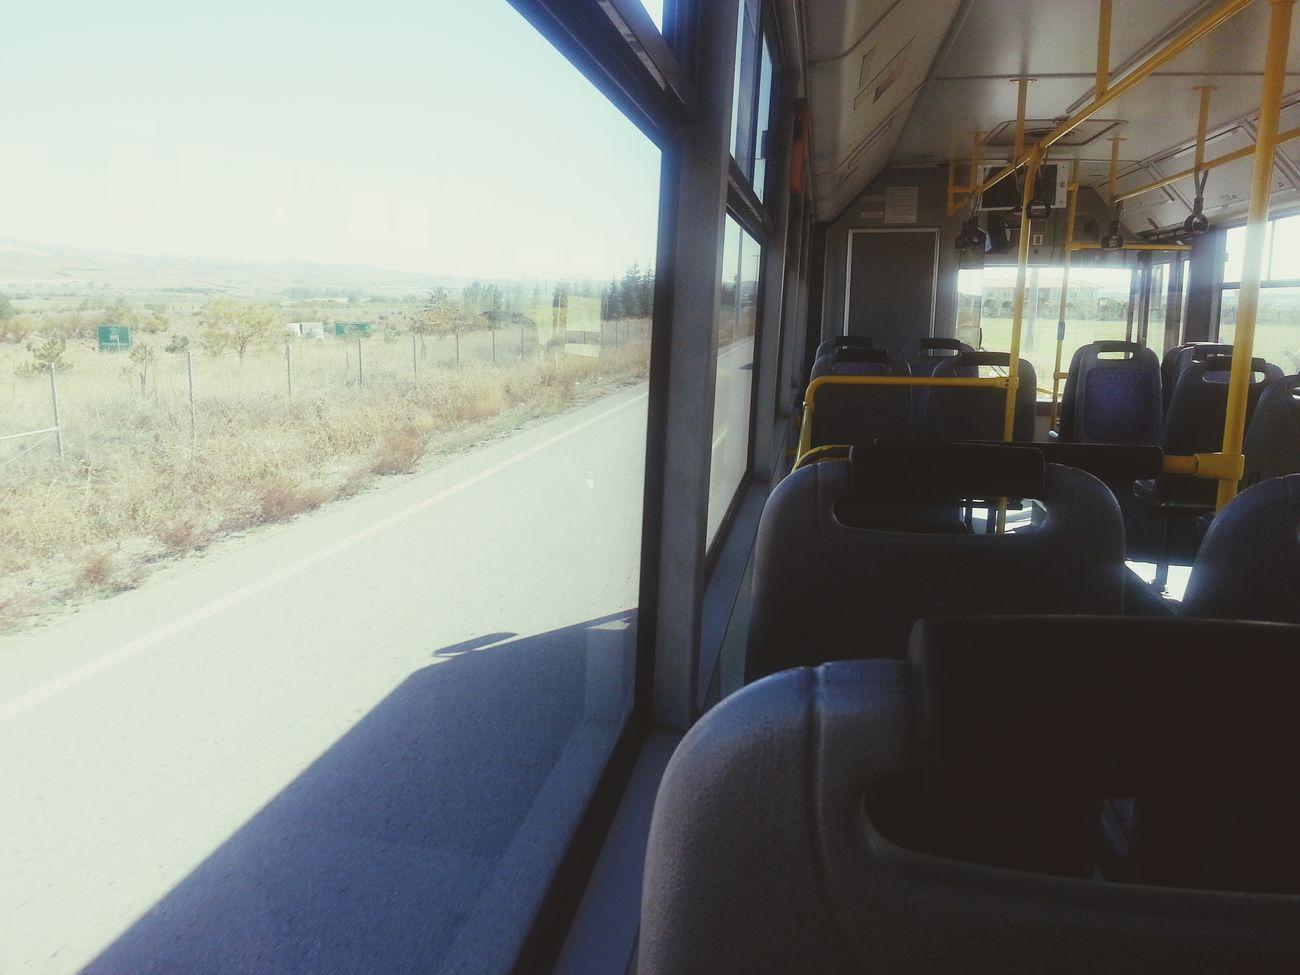 Empty Bus'sy. Bustravel Roadtrip On A Tour Popular Photos